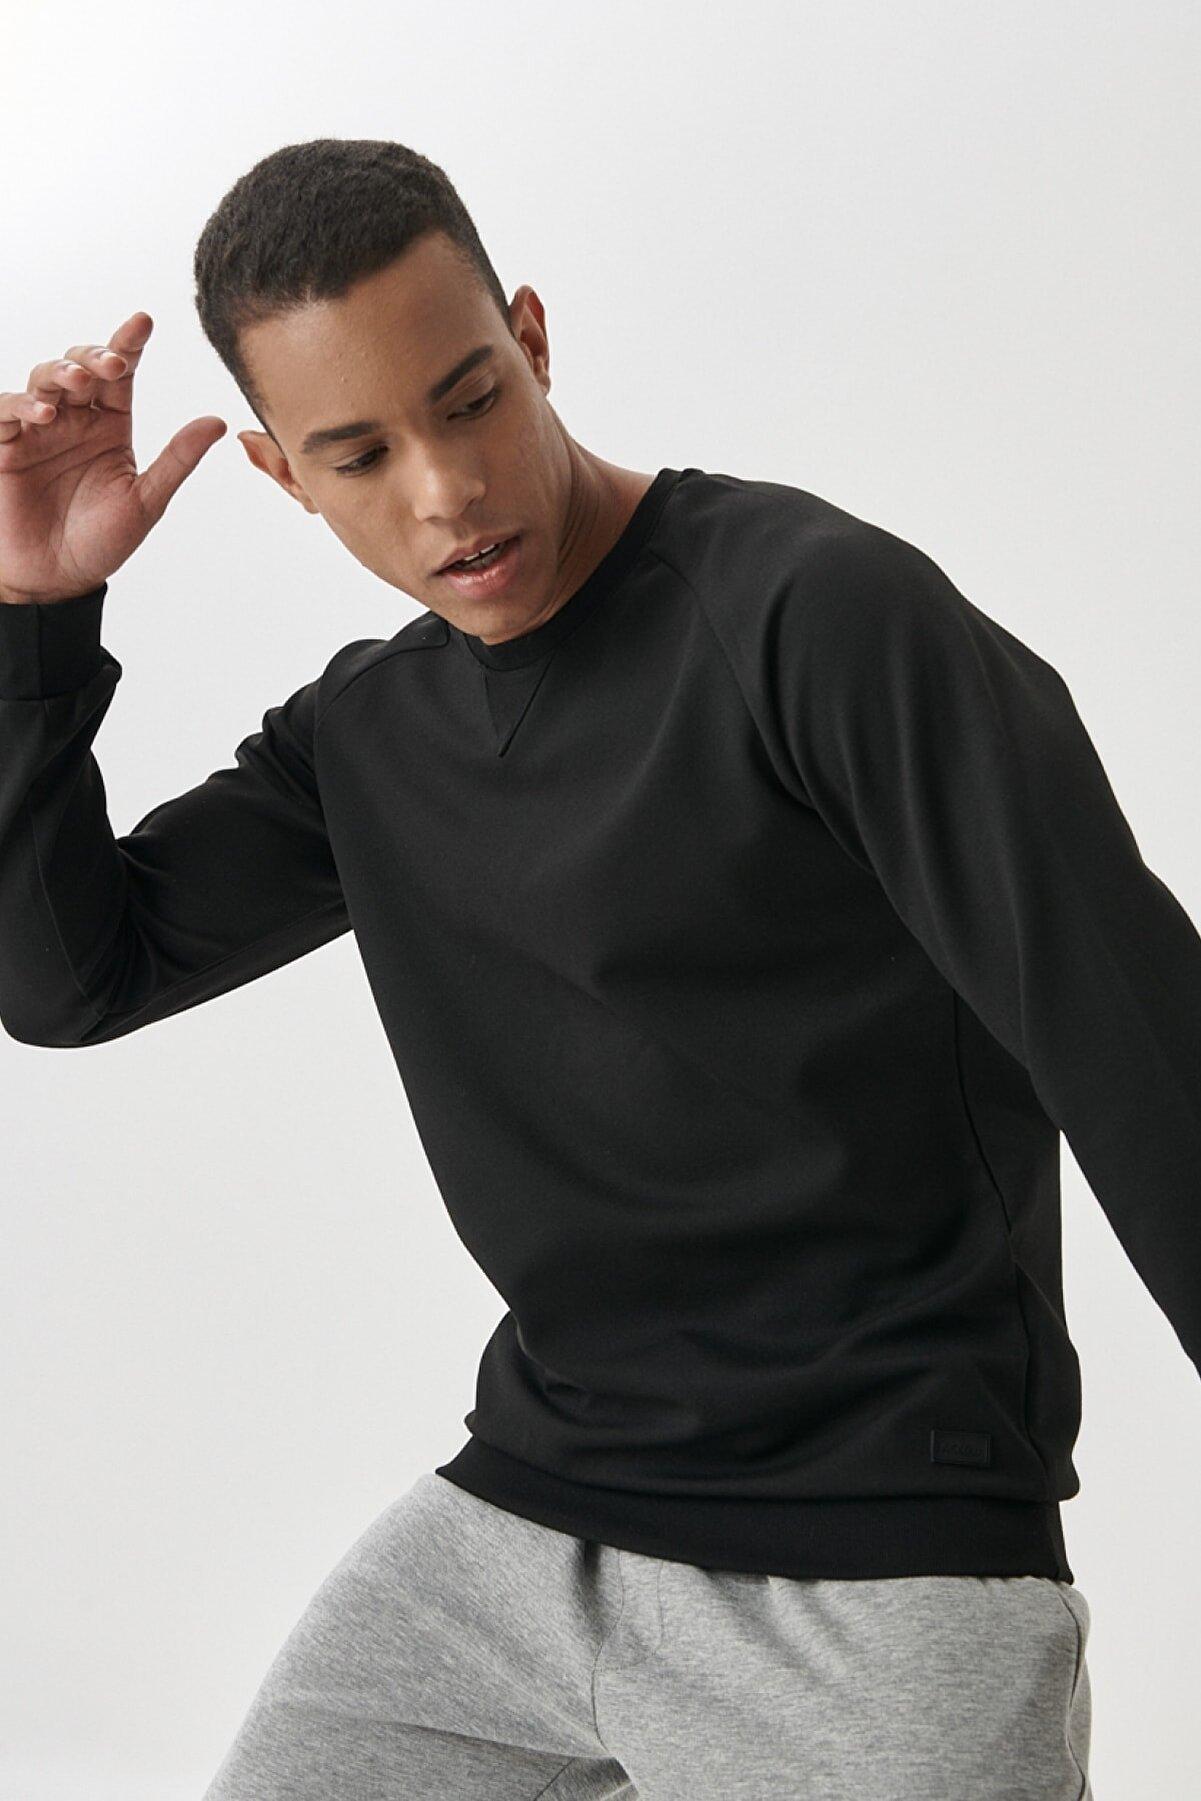 Altınyıldız Classics Erkek Siyah Standart Fit Günlük Rahat Bisiklet Yaka Spor Sweatshirt